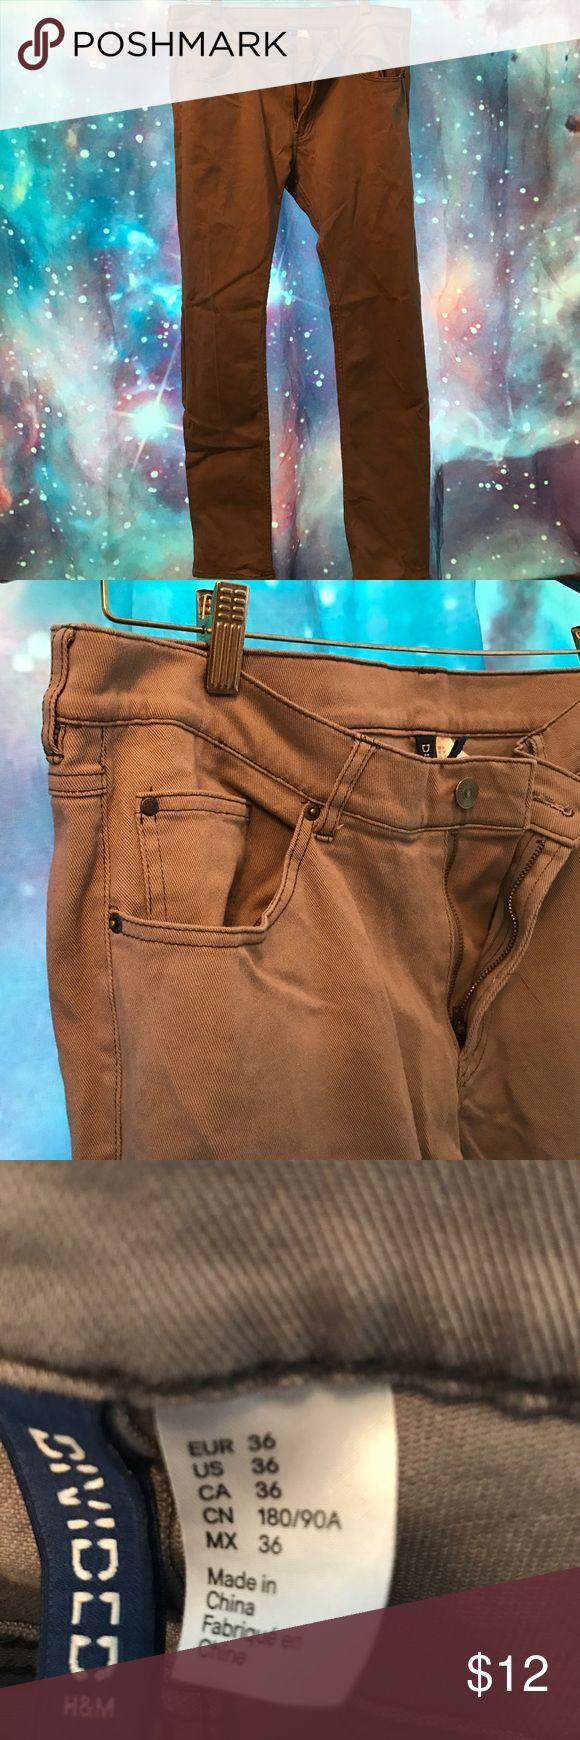 🔥🔥Grey Skinny Men's Jeans H&M🔥🔥 🔥🔥36w 34l h&m hot Deal 🔥🔥 H&M Jeans Skinny